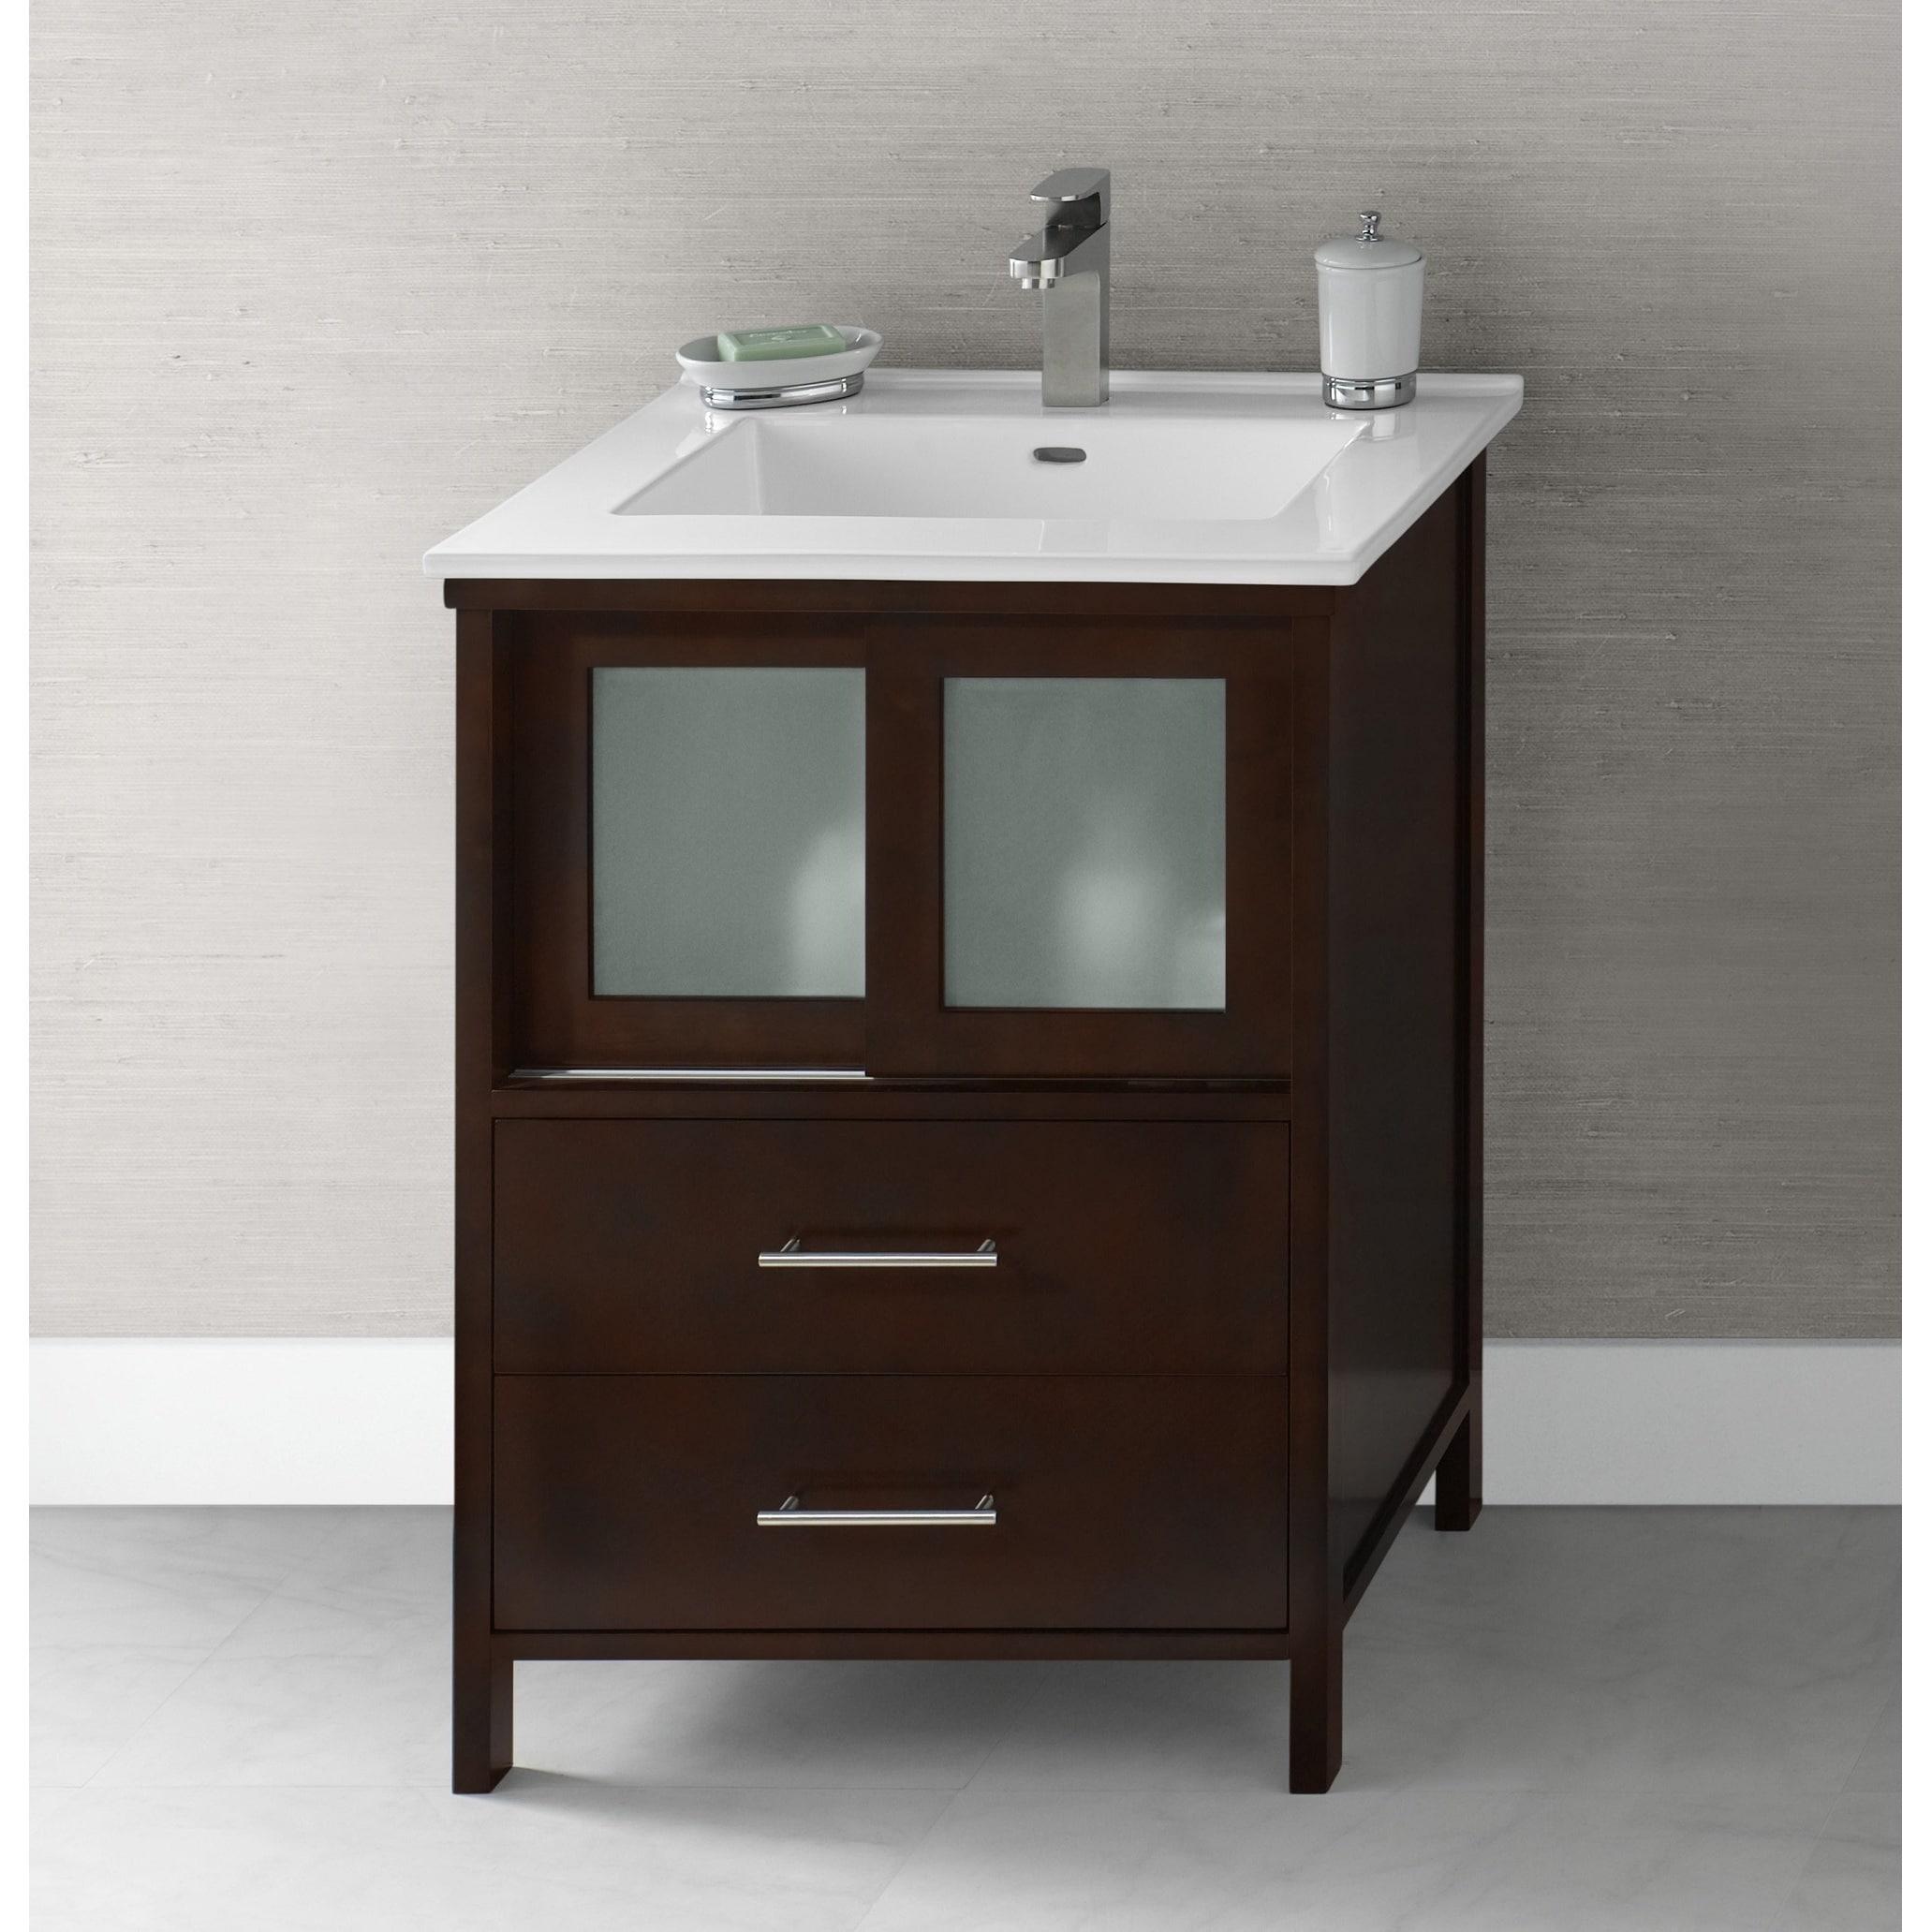 Ronbow Minerva 24 Inch Dark Cherry Bathroom Vanity Set With White Ceramic Sink Top Overstock 13983682